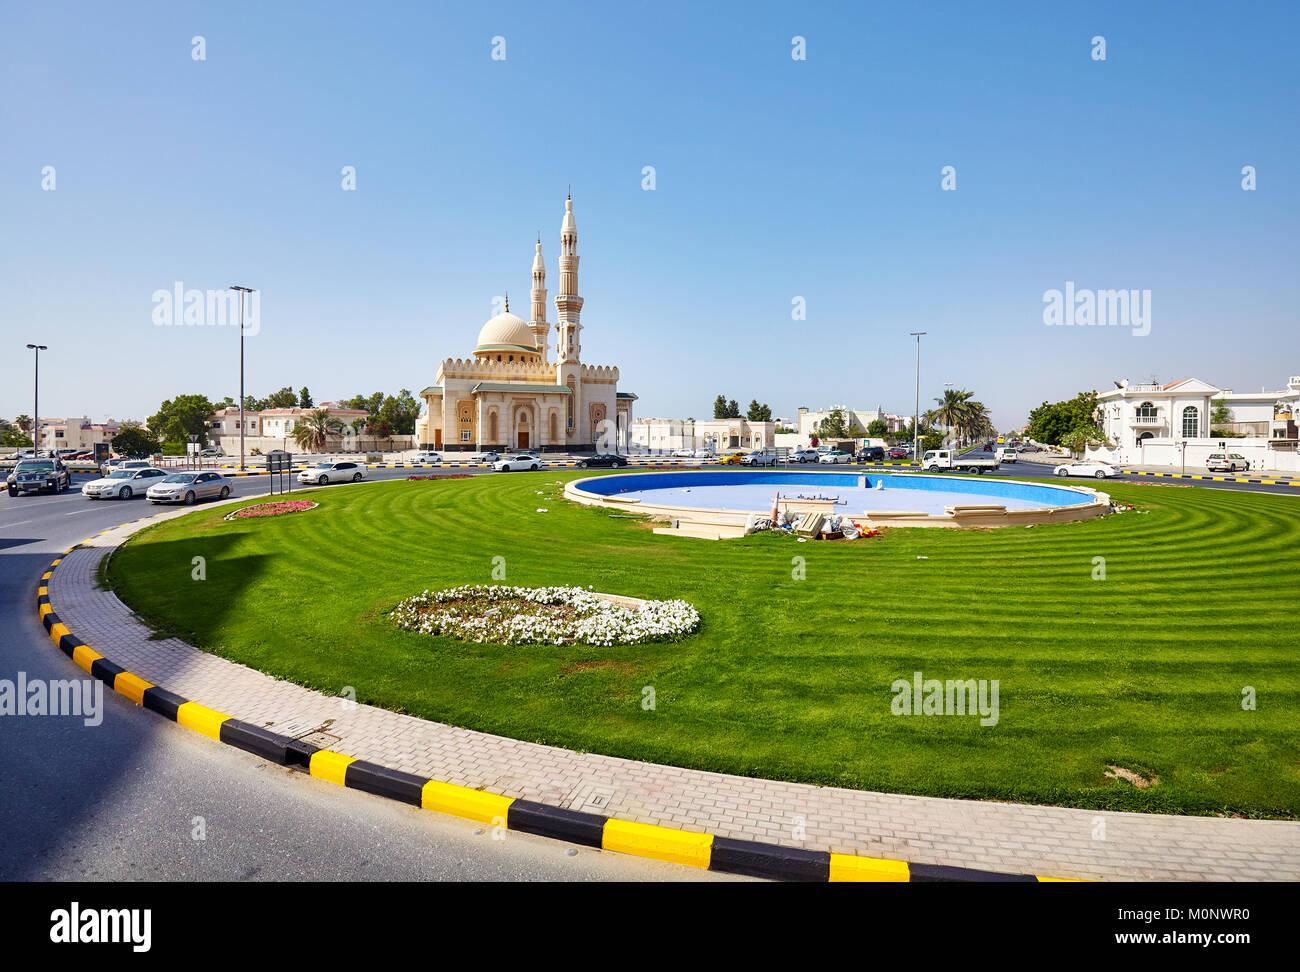 Sharjah Stock Photos Amp Sharjah Stock Images Alamy